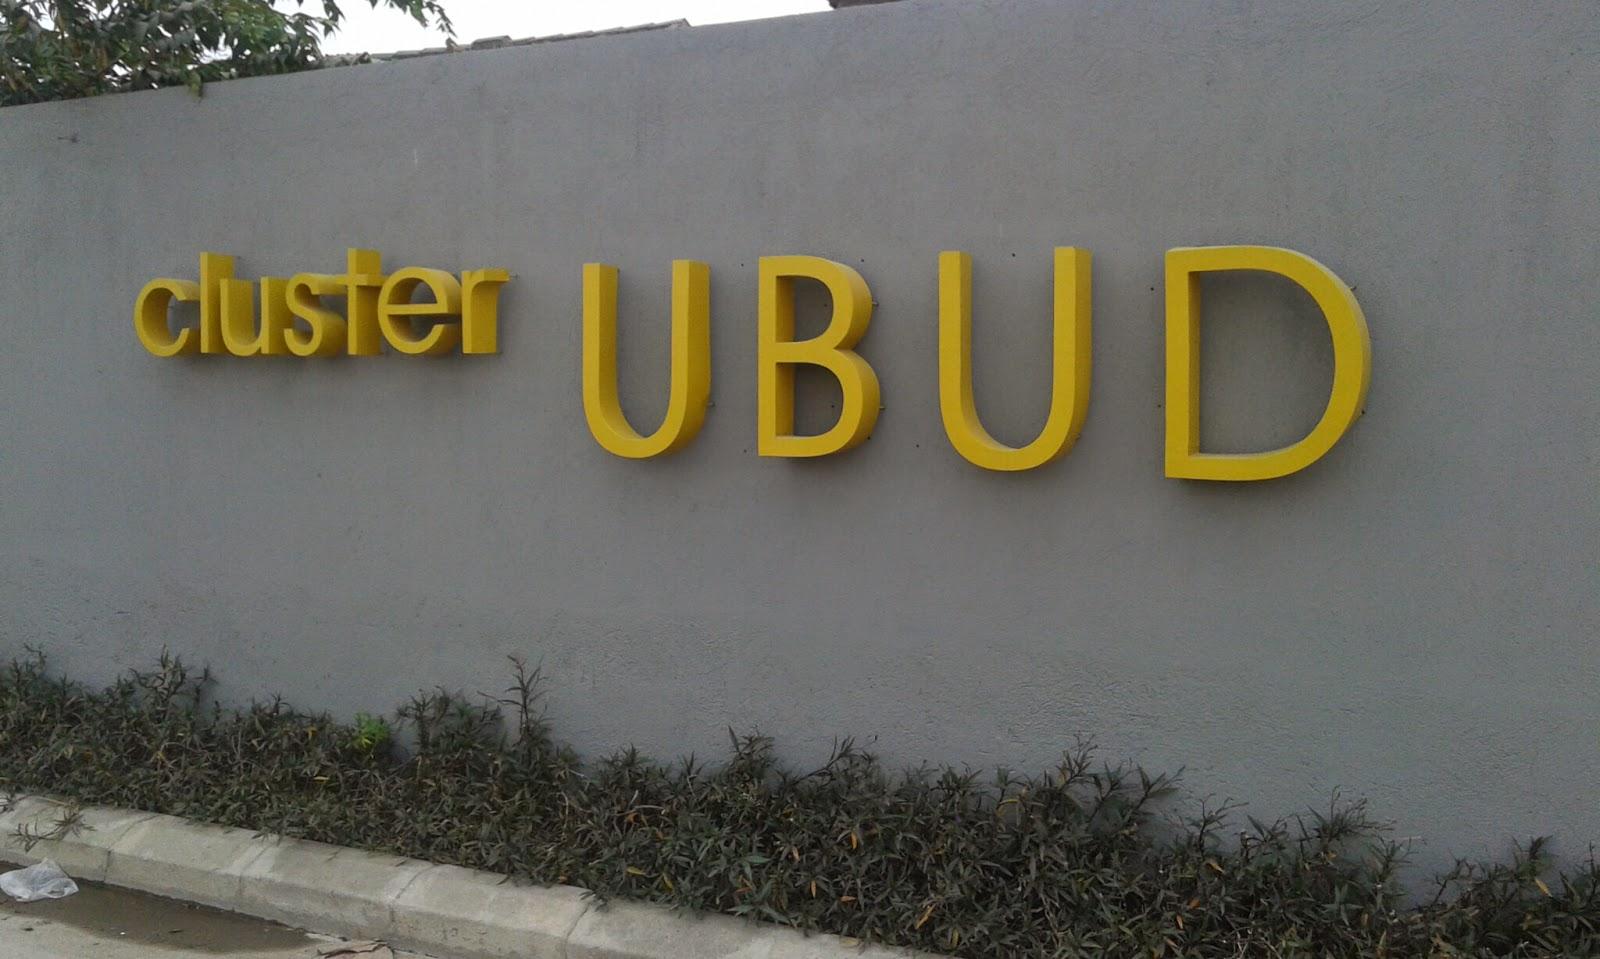 cluster ubud - cluster ubud bekasi utara - cluster ubud grand pondok ungu - jual rumah cluster ubud bekasi utara